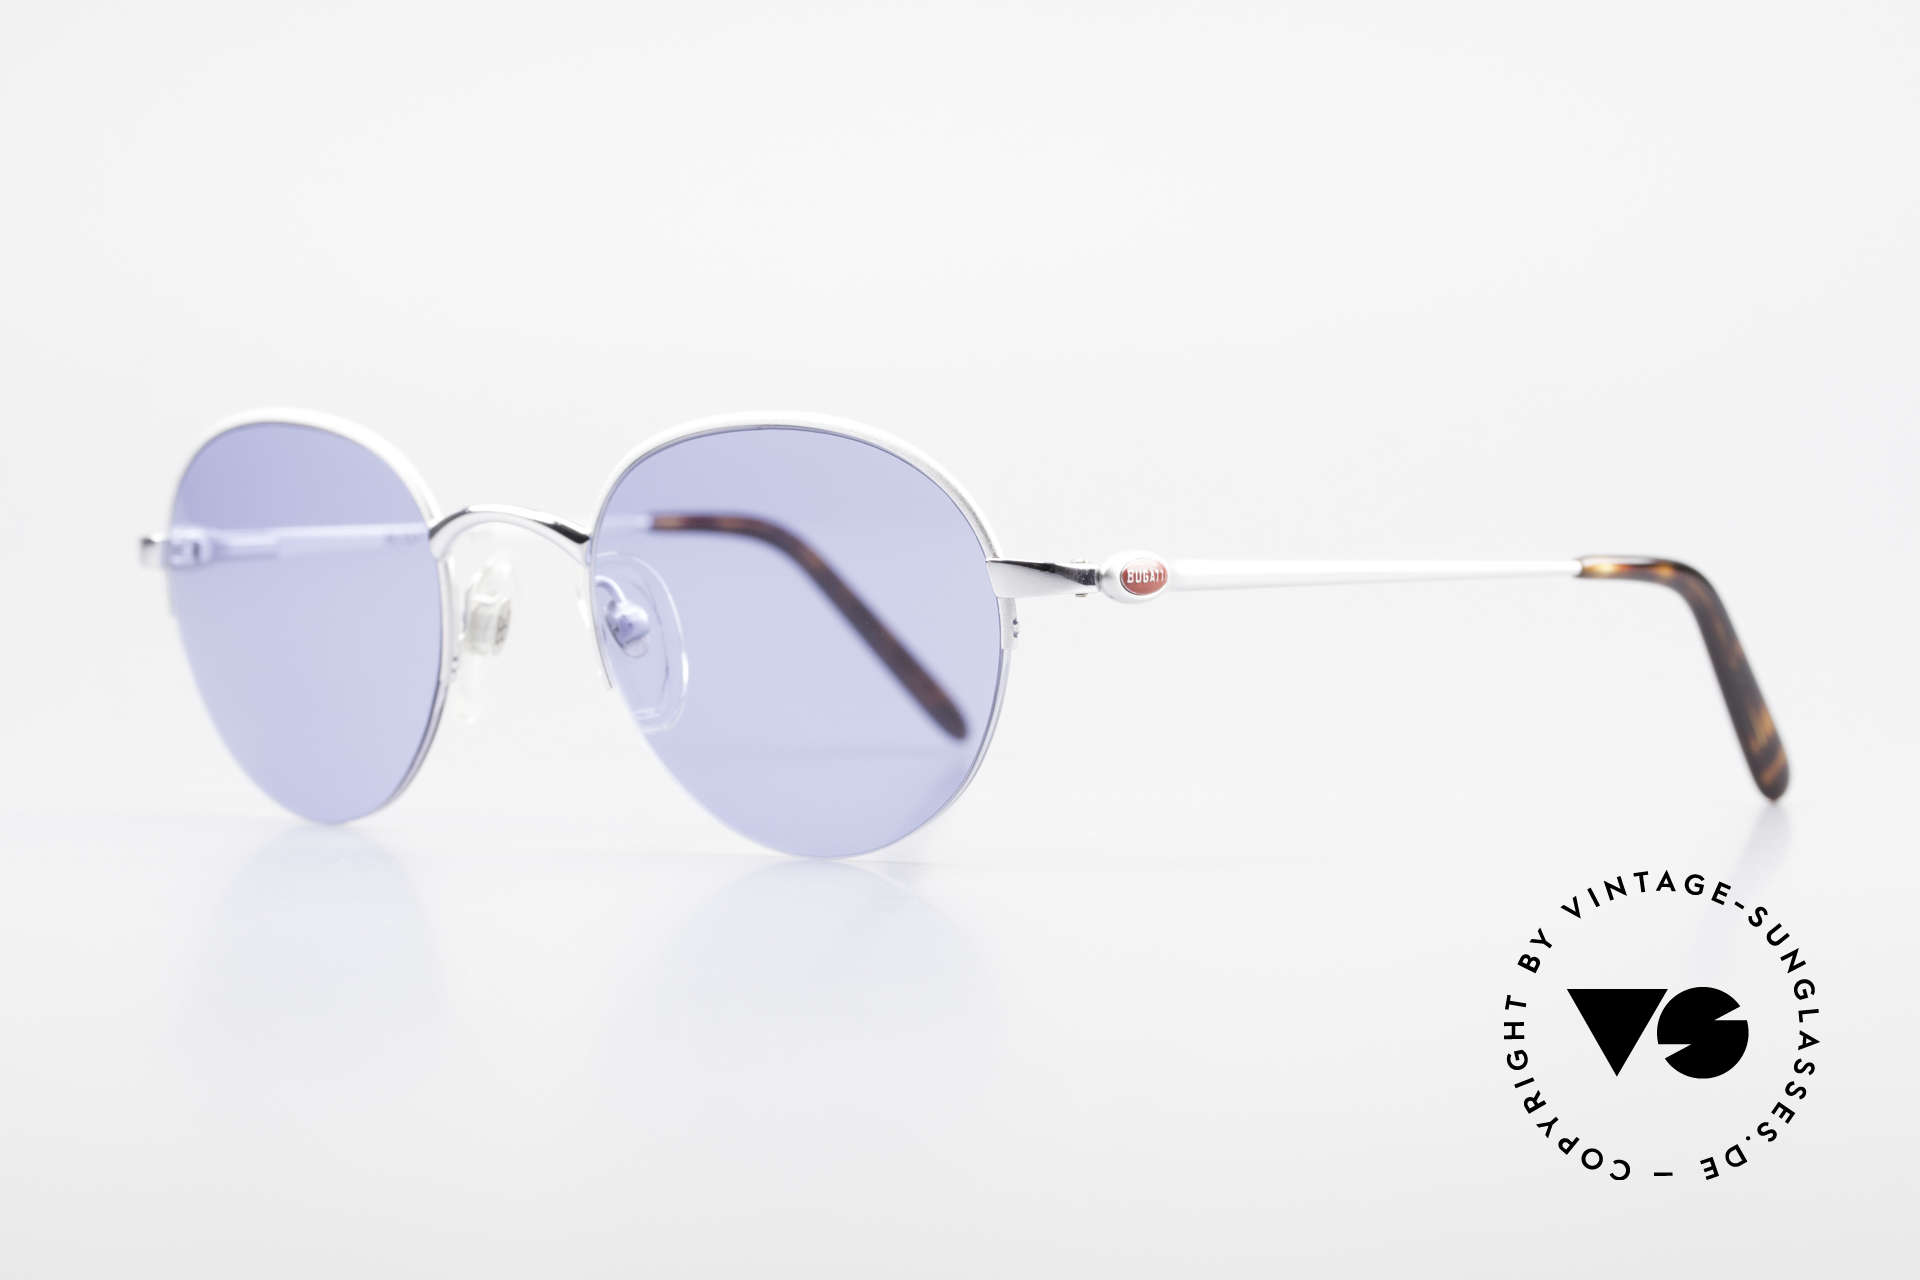 Bugatti 26670 Round Panto Bugatti Glasses, noble silver-plated / titan frame & flexible hinges, Made for Men